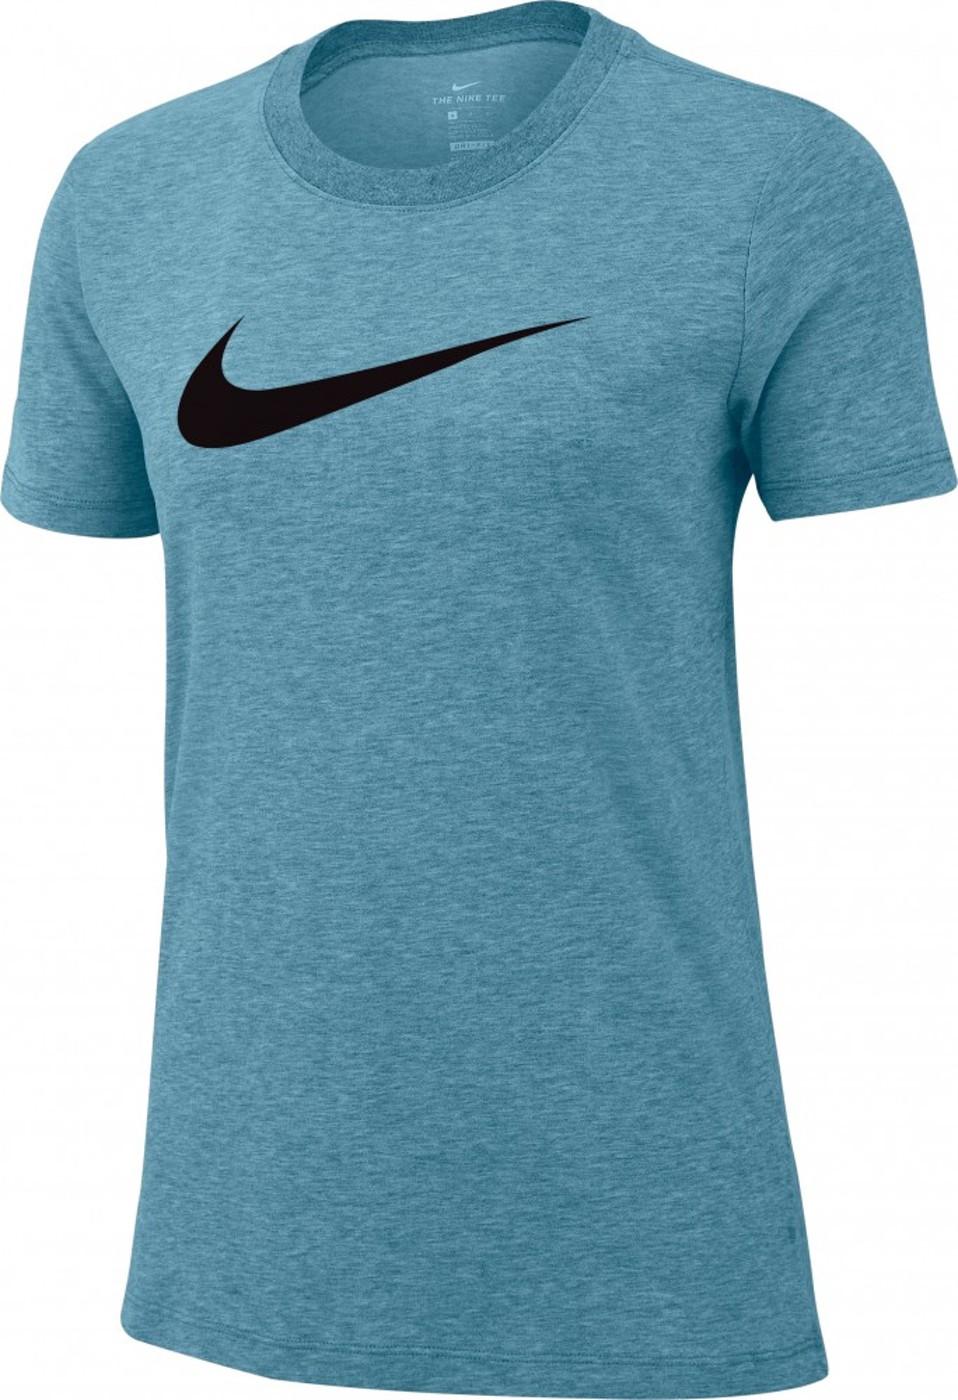 Nike Dri-FIT Training - Damen